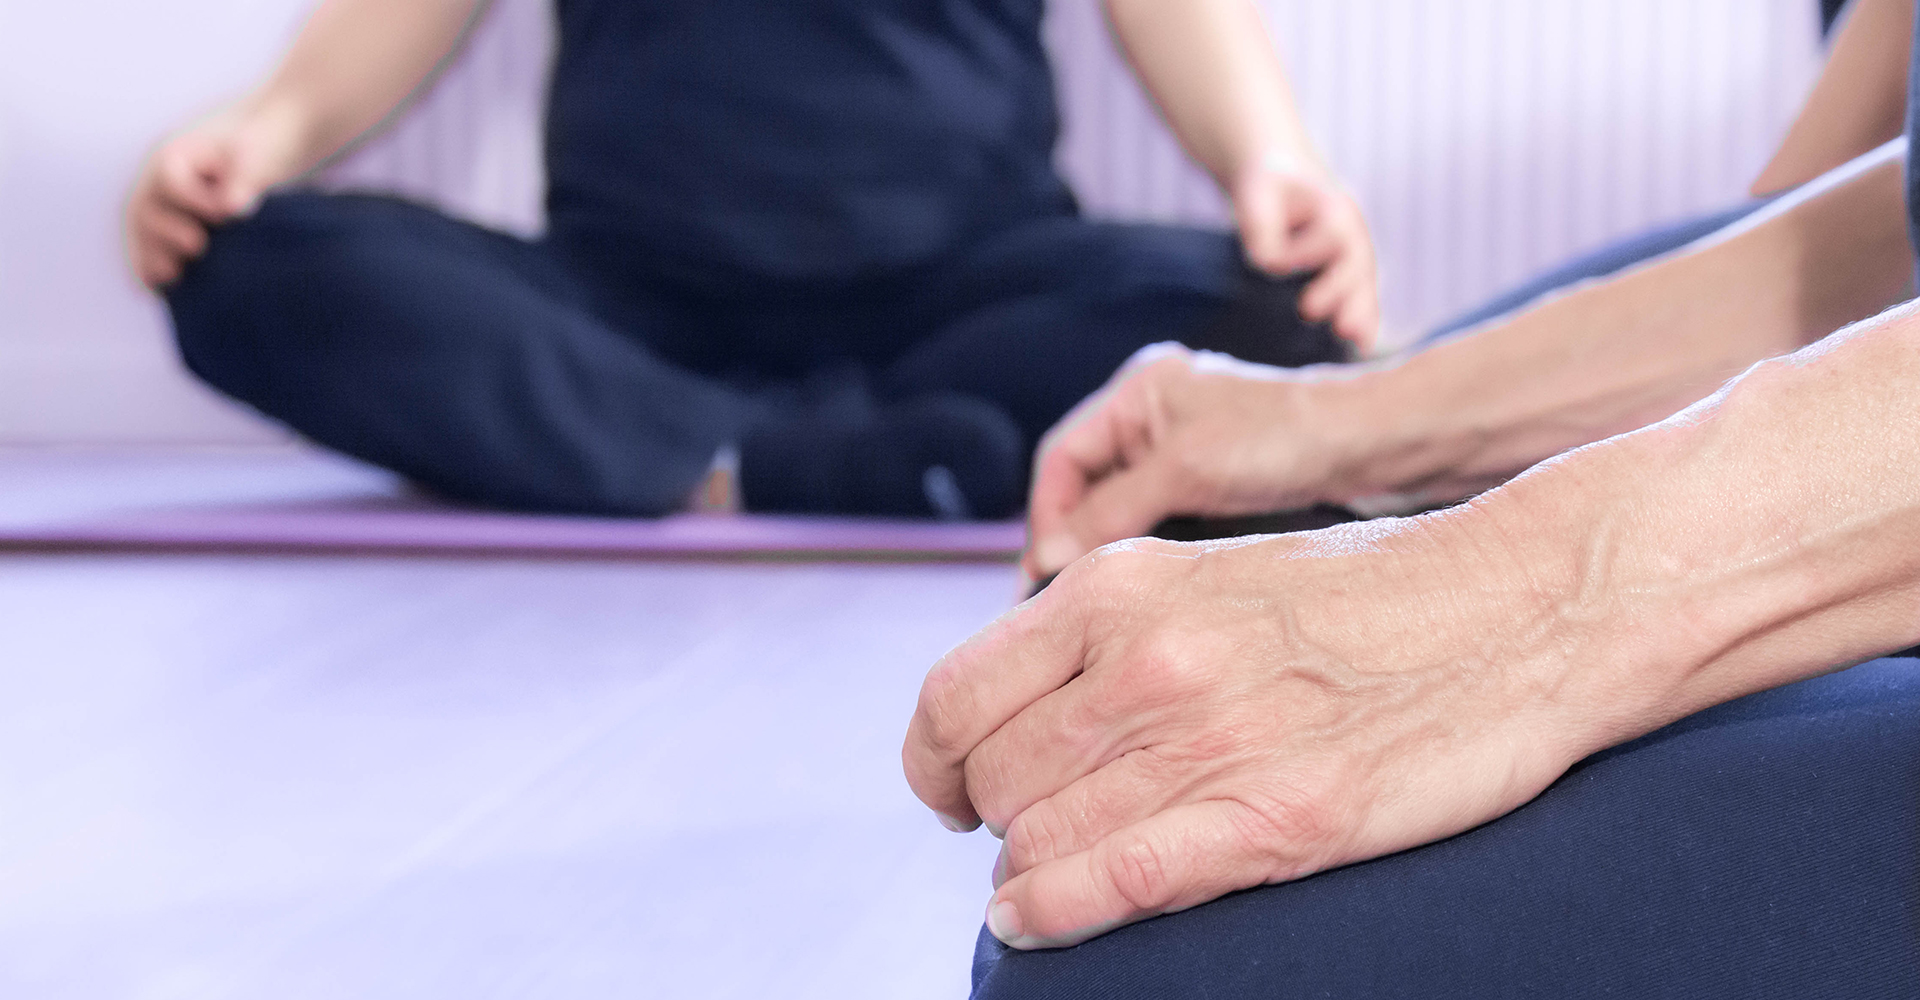 cours-de-hatha-yoga-meditation-relaxation-anjayati-val-d-oise